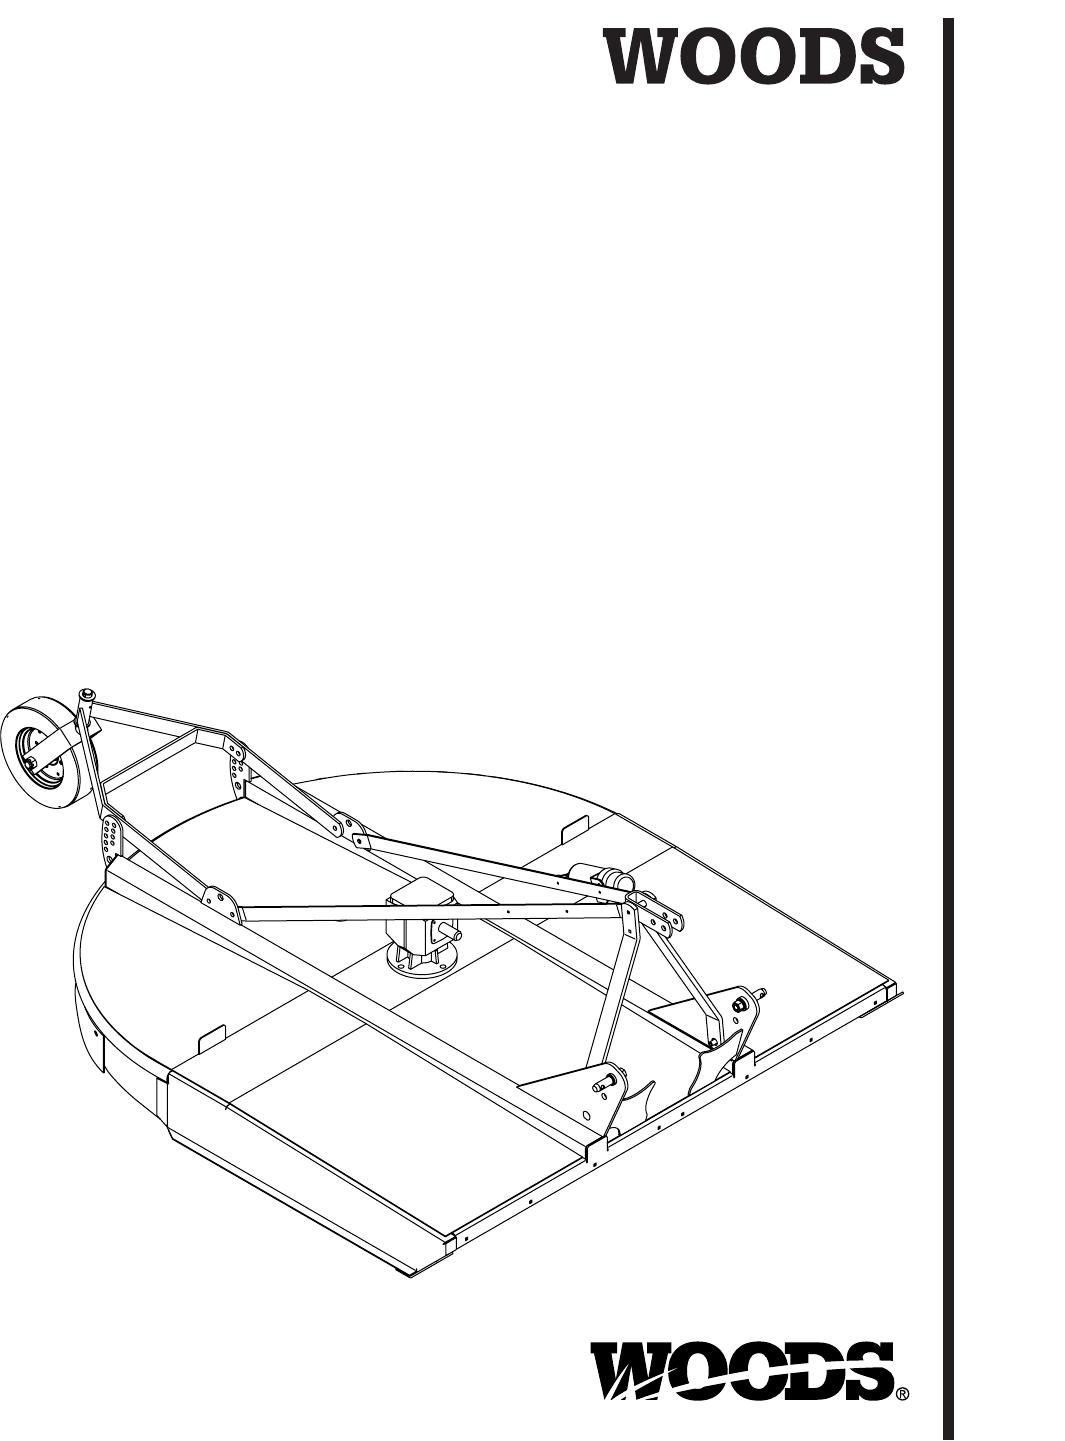 Brushbull Rotary Cutter BB48, BB60, BB72, And BB84